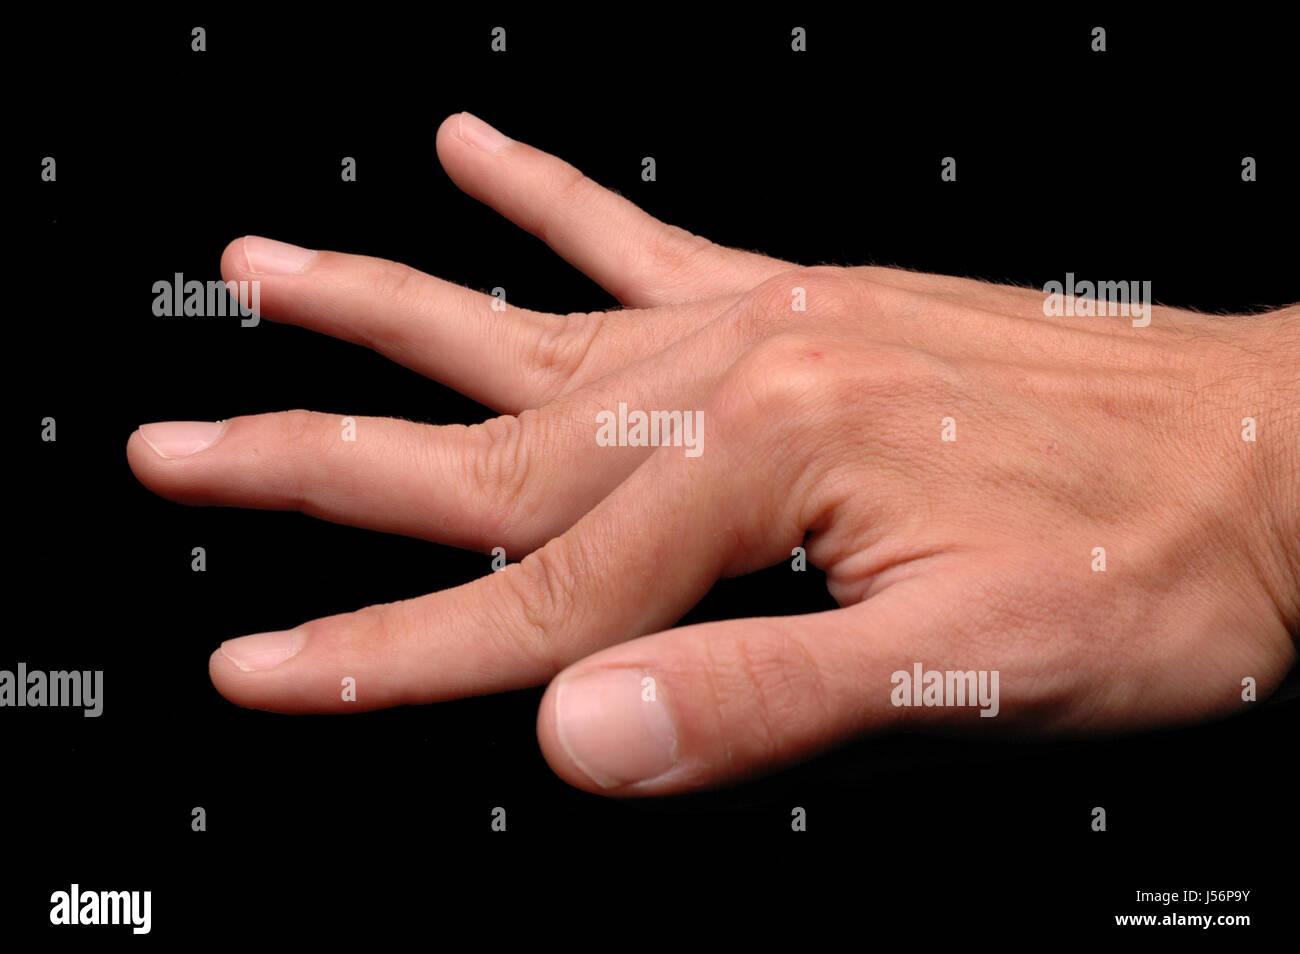 ehlers-danlos syndrome Stock Photo: 140905463 - Alamy